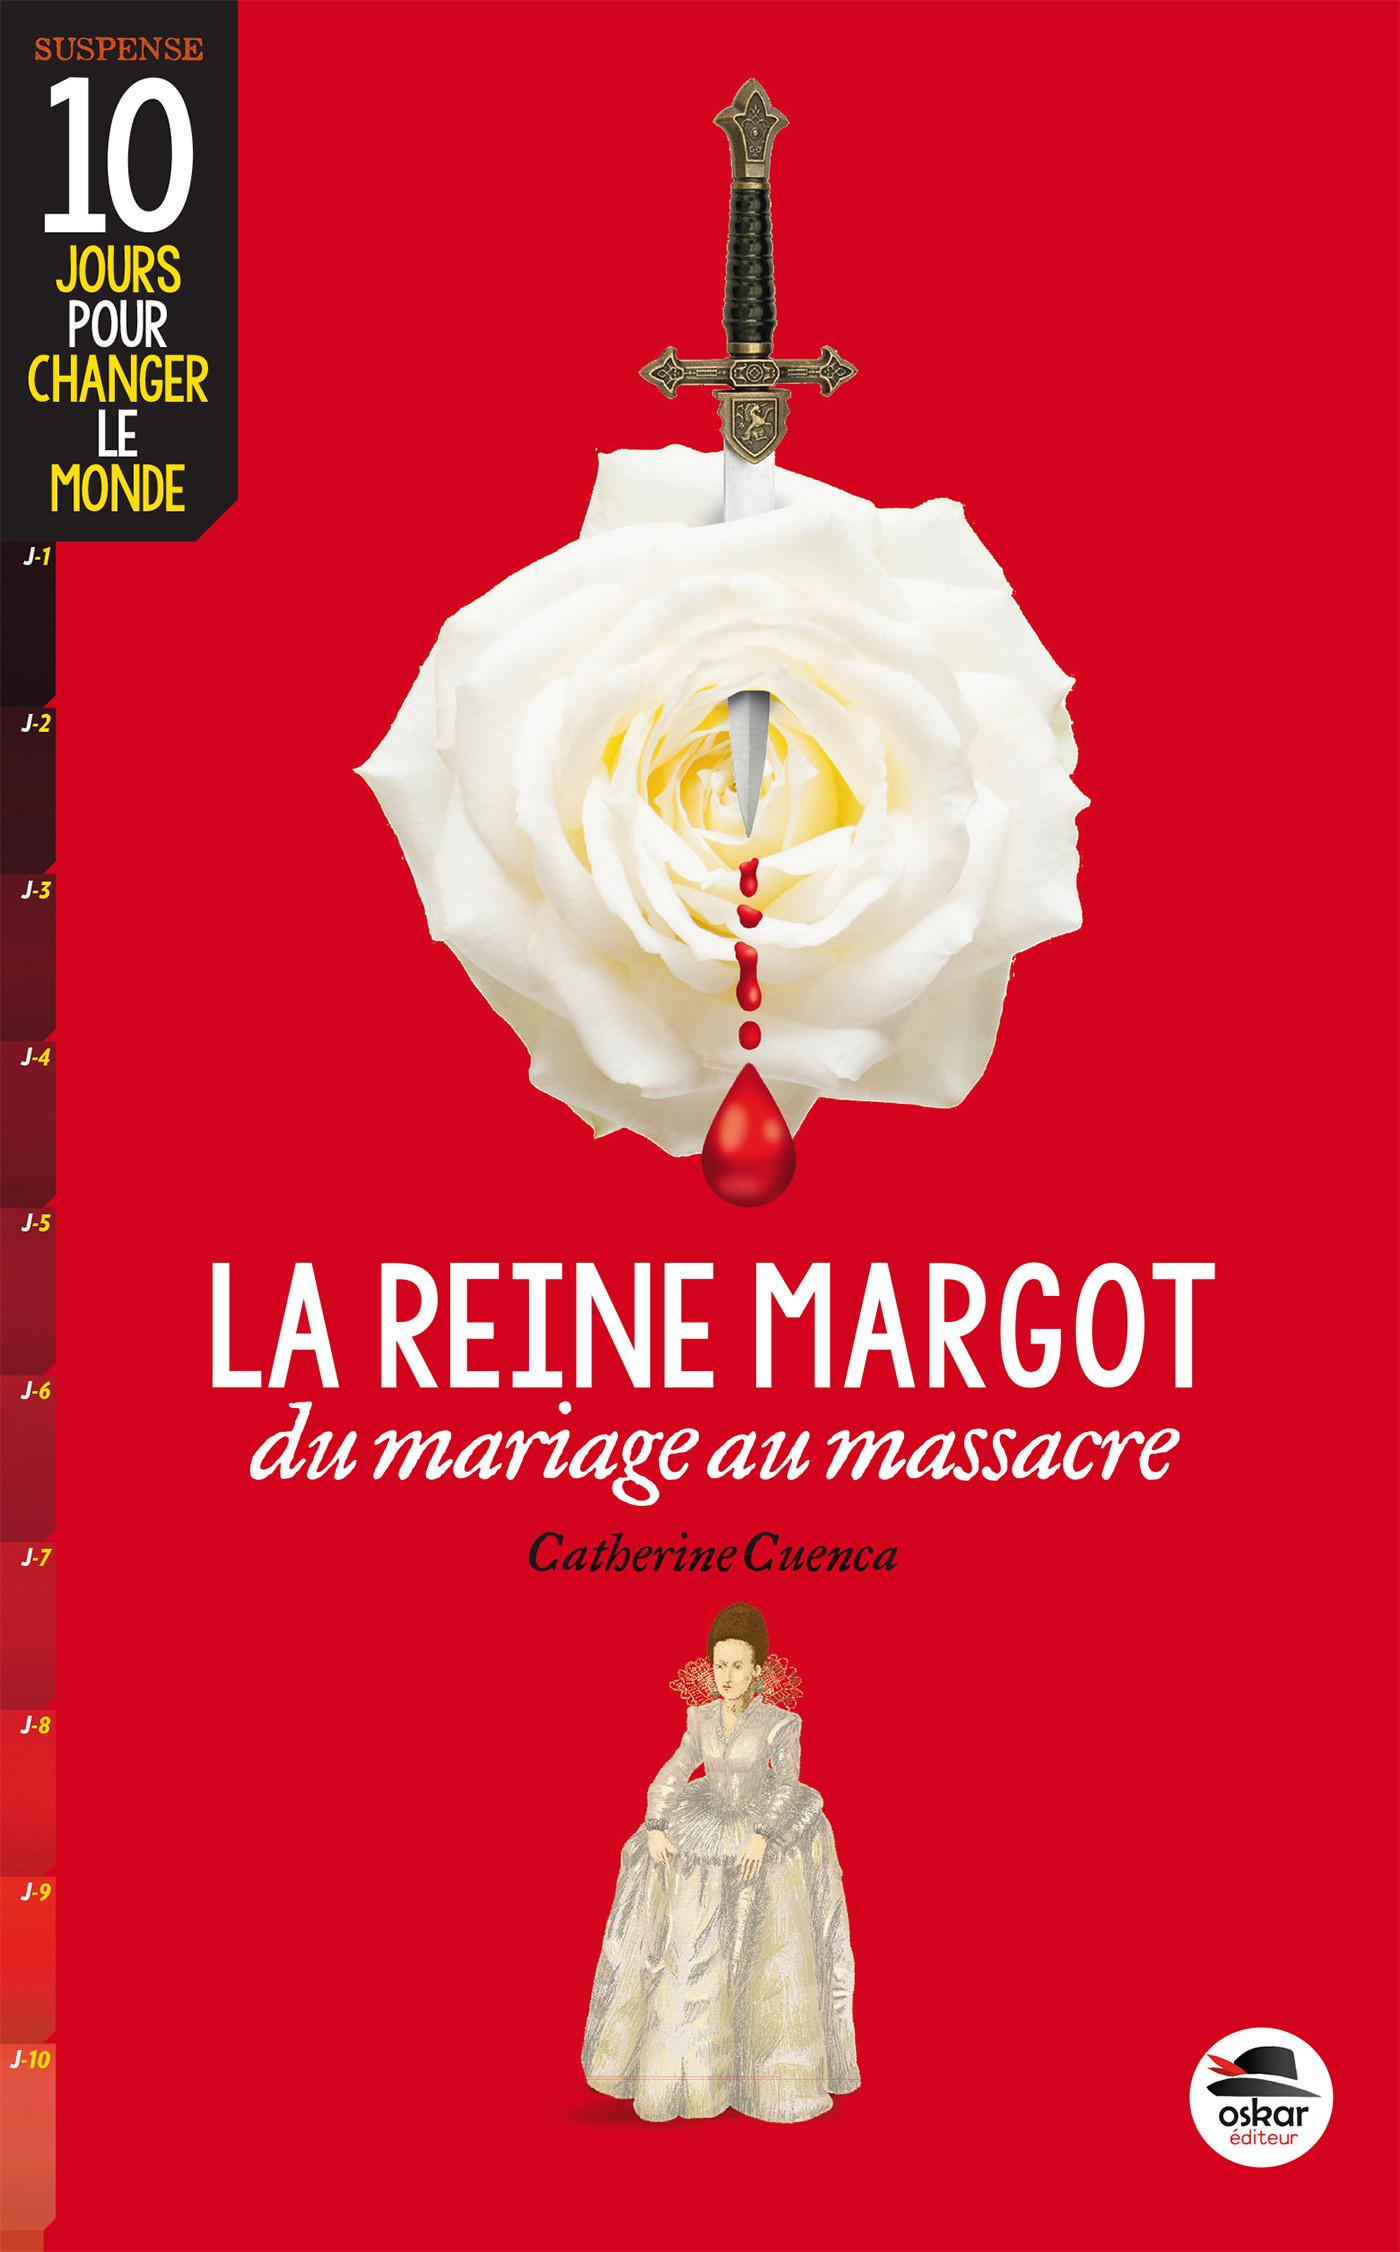 REINE MARGOT (LA) - DU MARIAGE AU MASSACRE